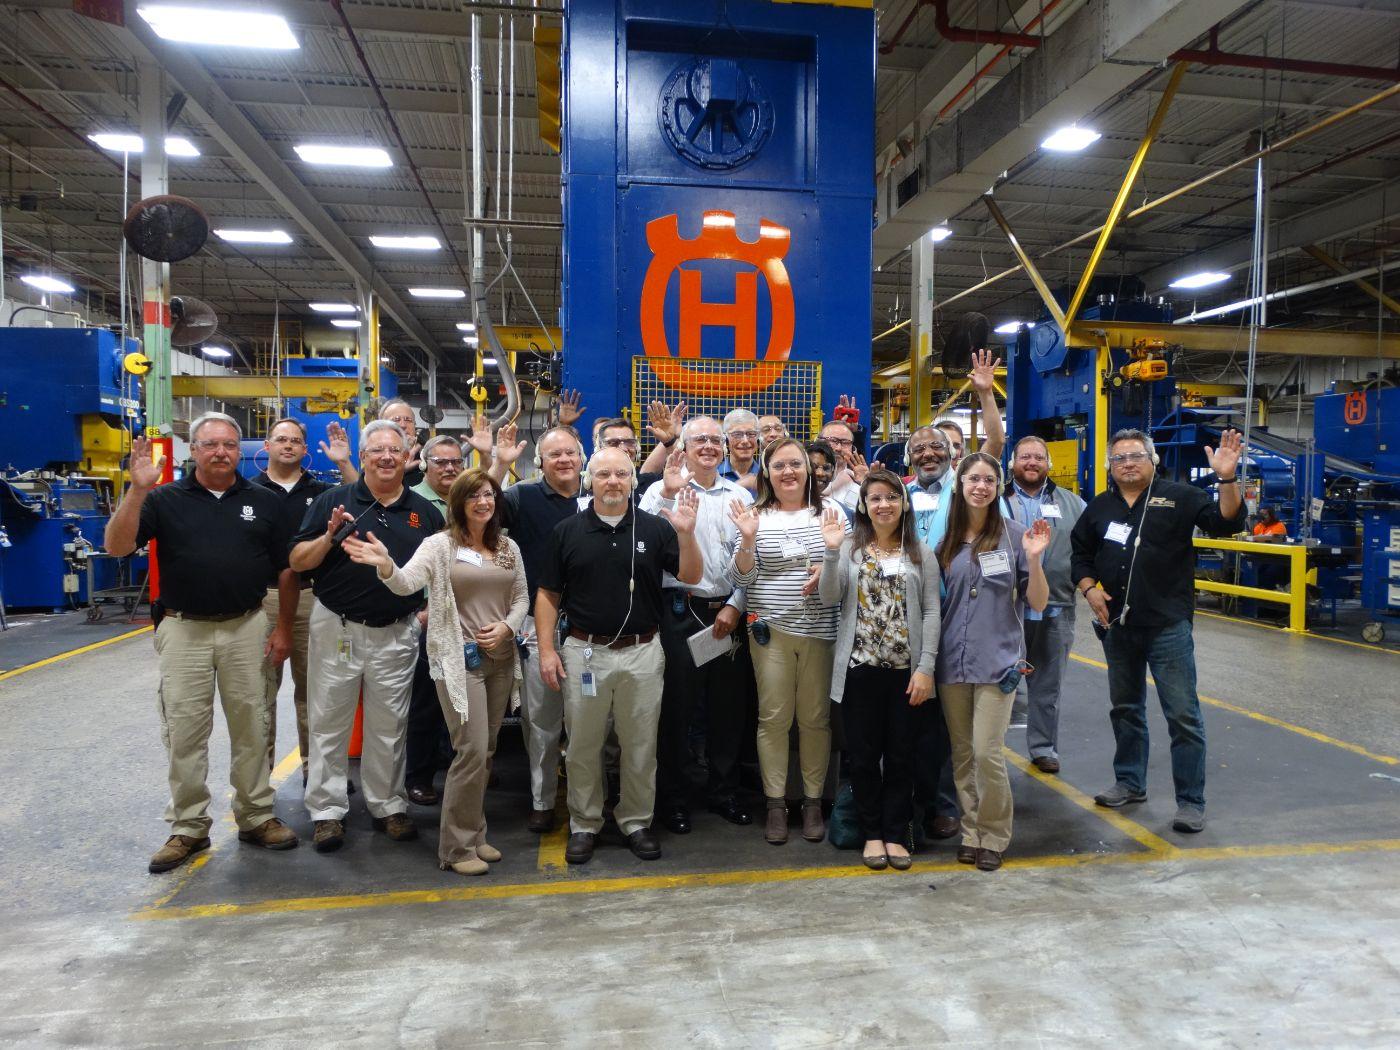 Manufacturing Plant Tour Questions